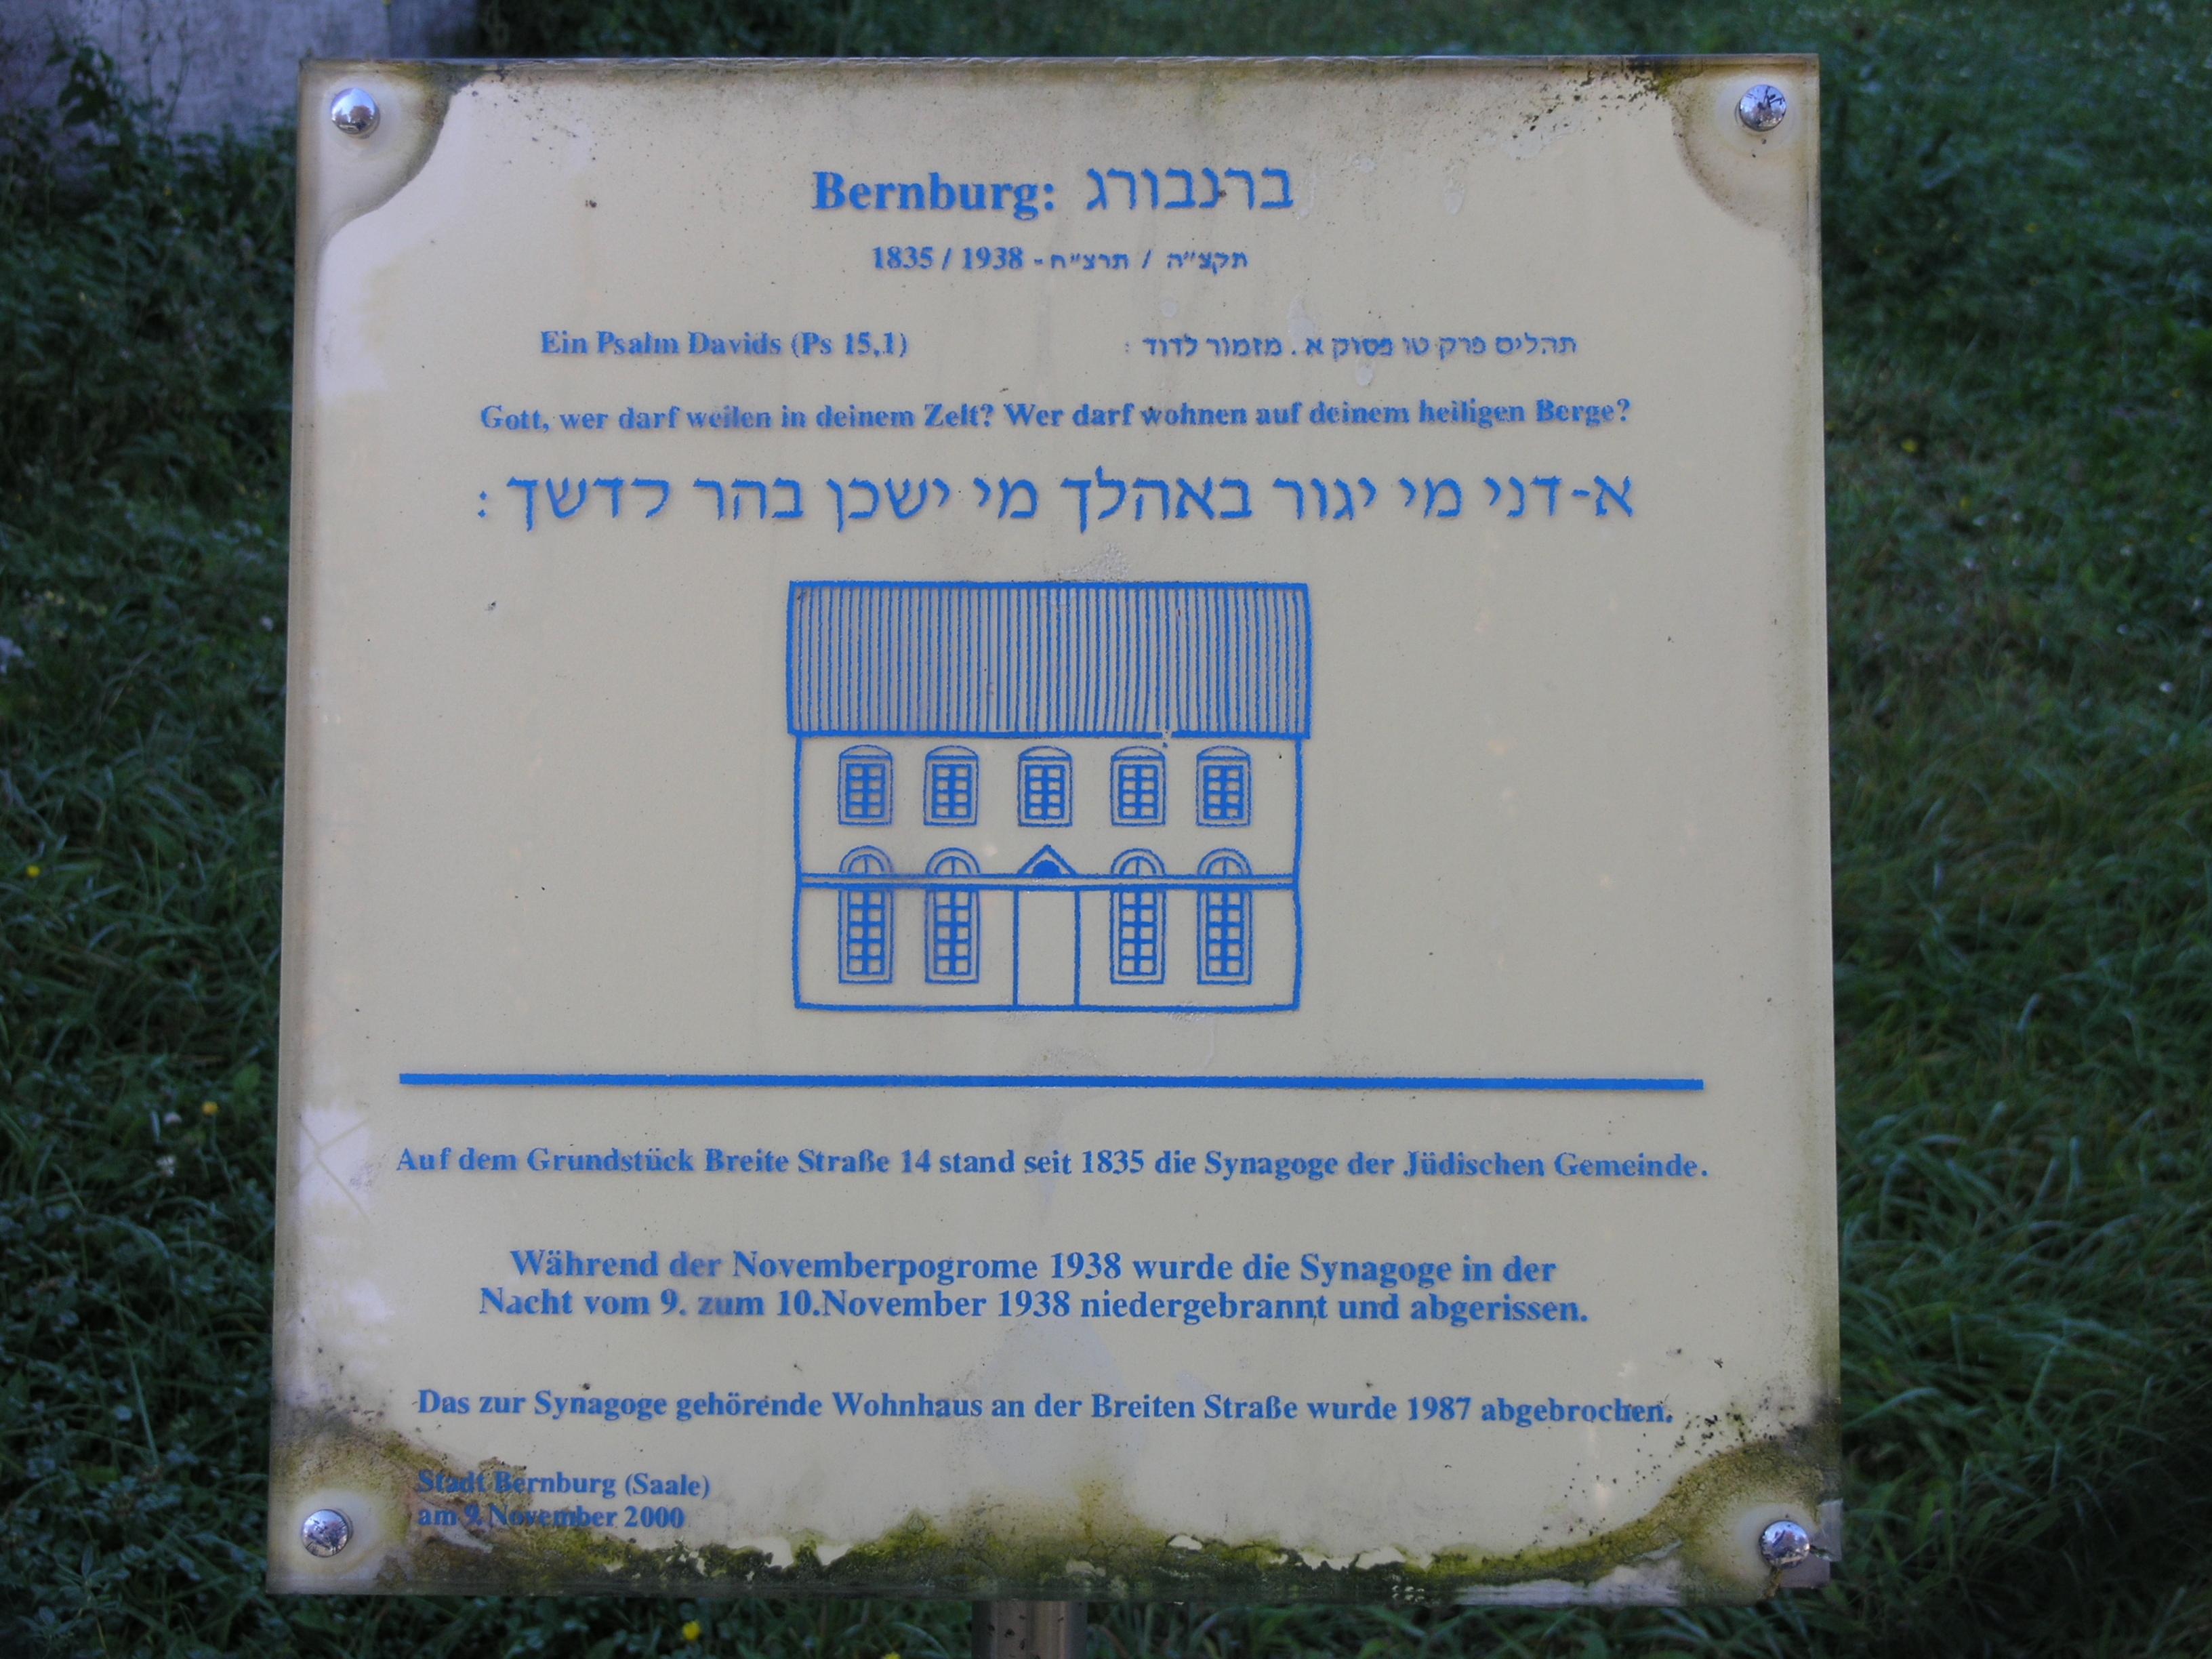 https://upload.wikimedia.org/wikipedia/commons/6/66/Bernburg_Synagoge_Breite-Strasse_14_-_Mahnmal.jpg